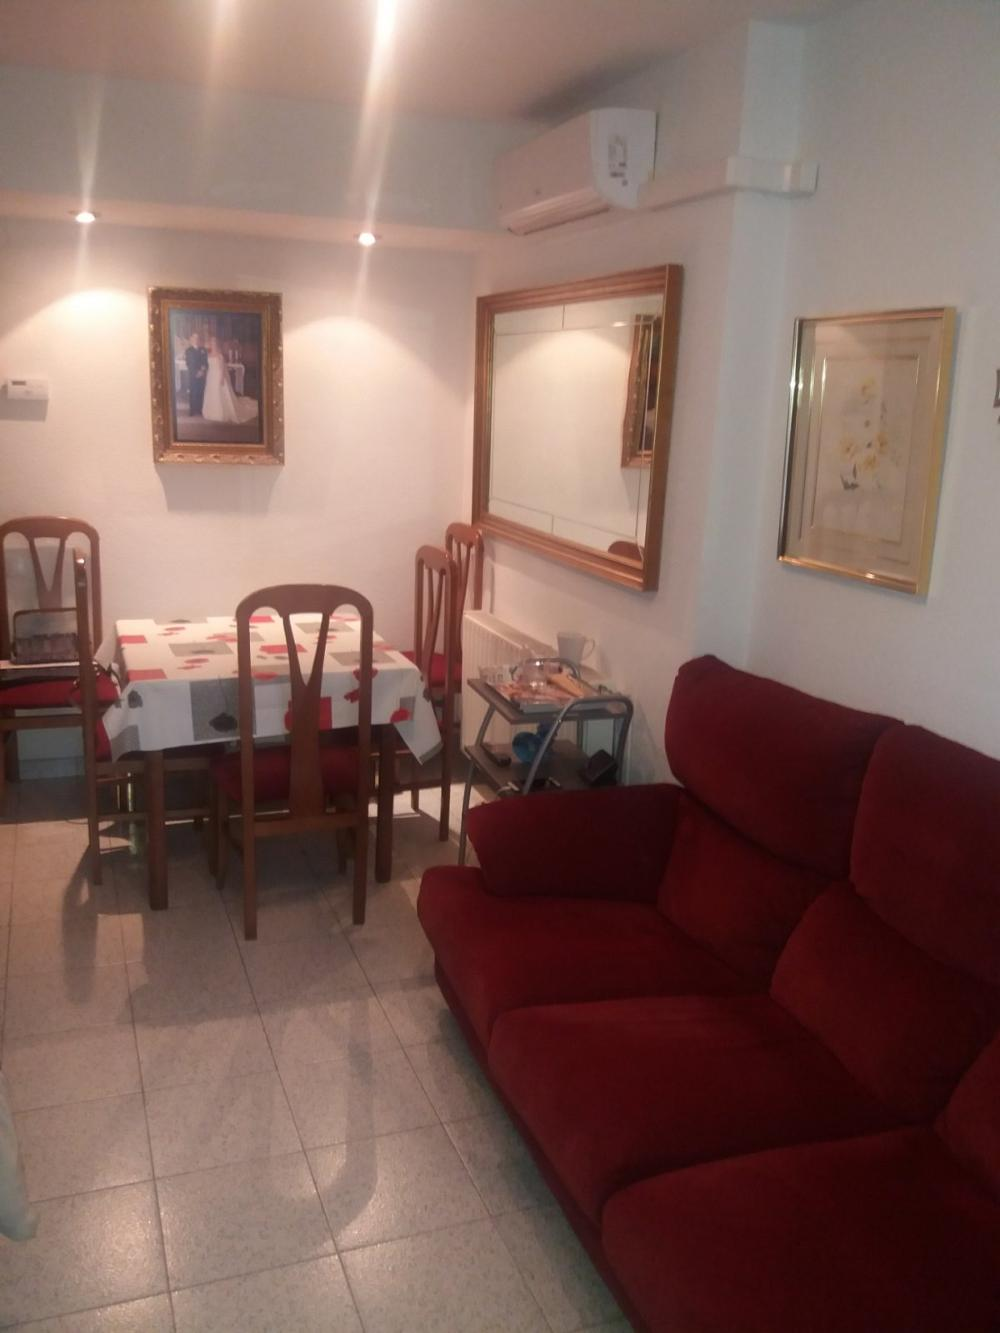 alcalá de henares 28802 madrid appartement photo 3051325